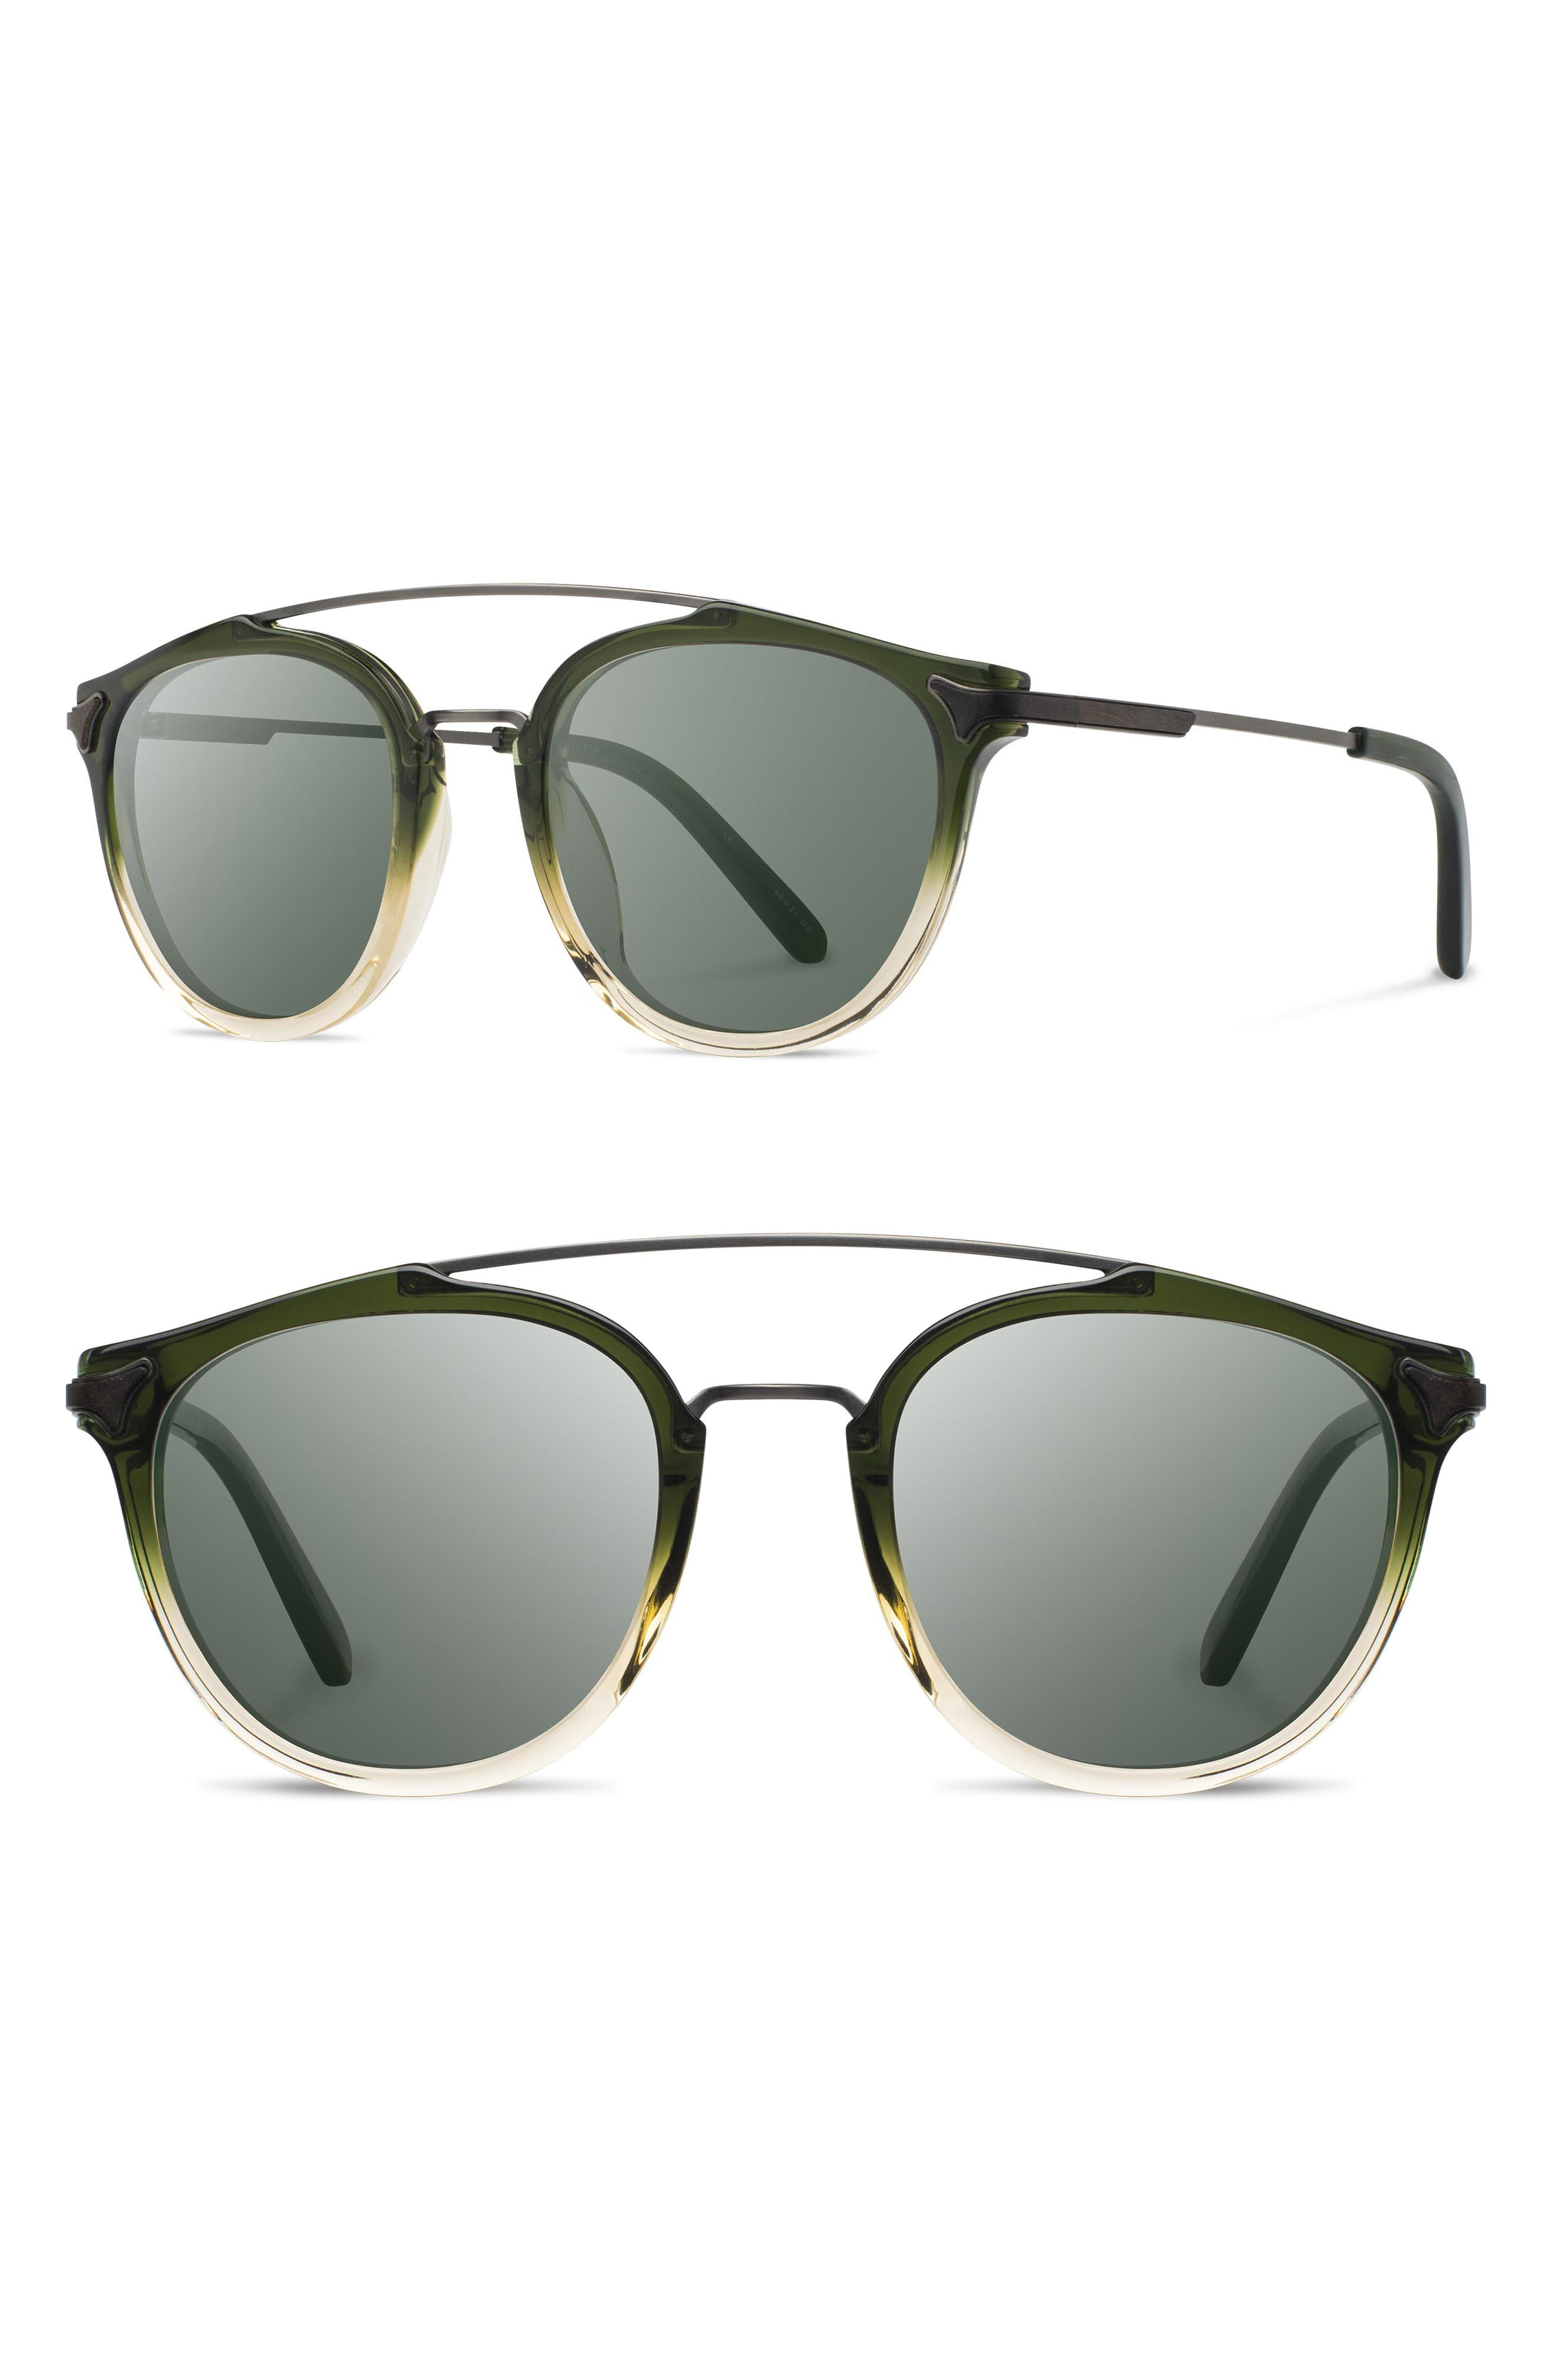 SHWOOD Kinsrow 49Mm Polarized Round Sunglasses - Mojito/ G15